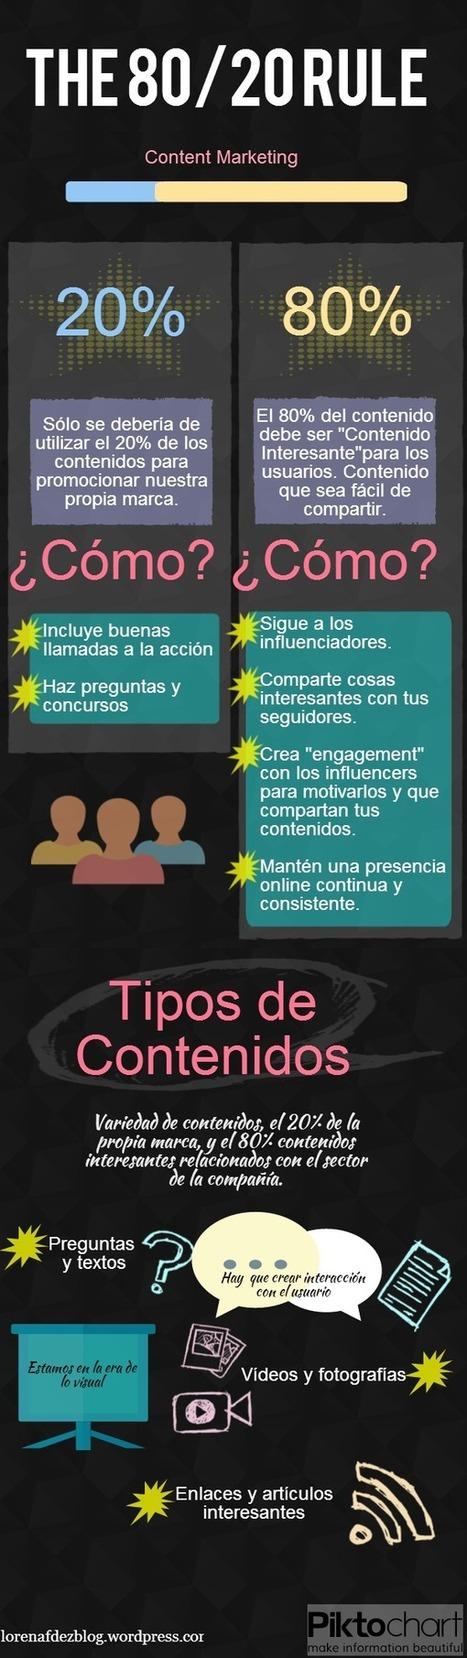 Content Marketing: The 80/20 Rule   Lorena Fdez Blog   Marketing de contenidos   Scoop.it